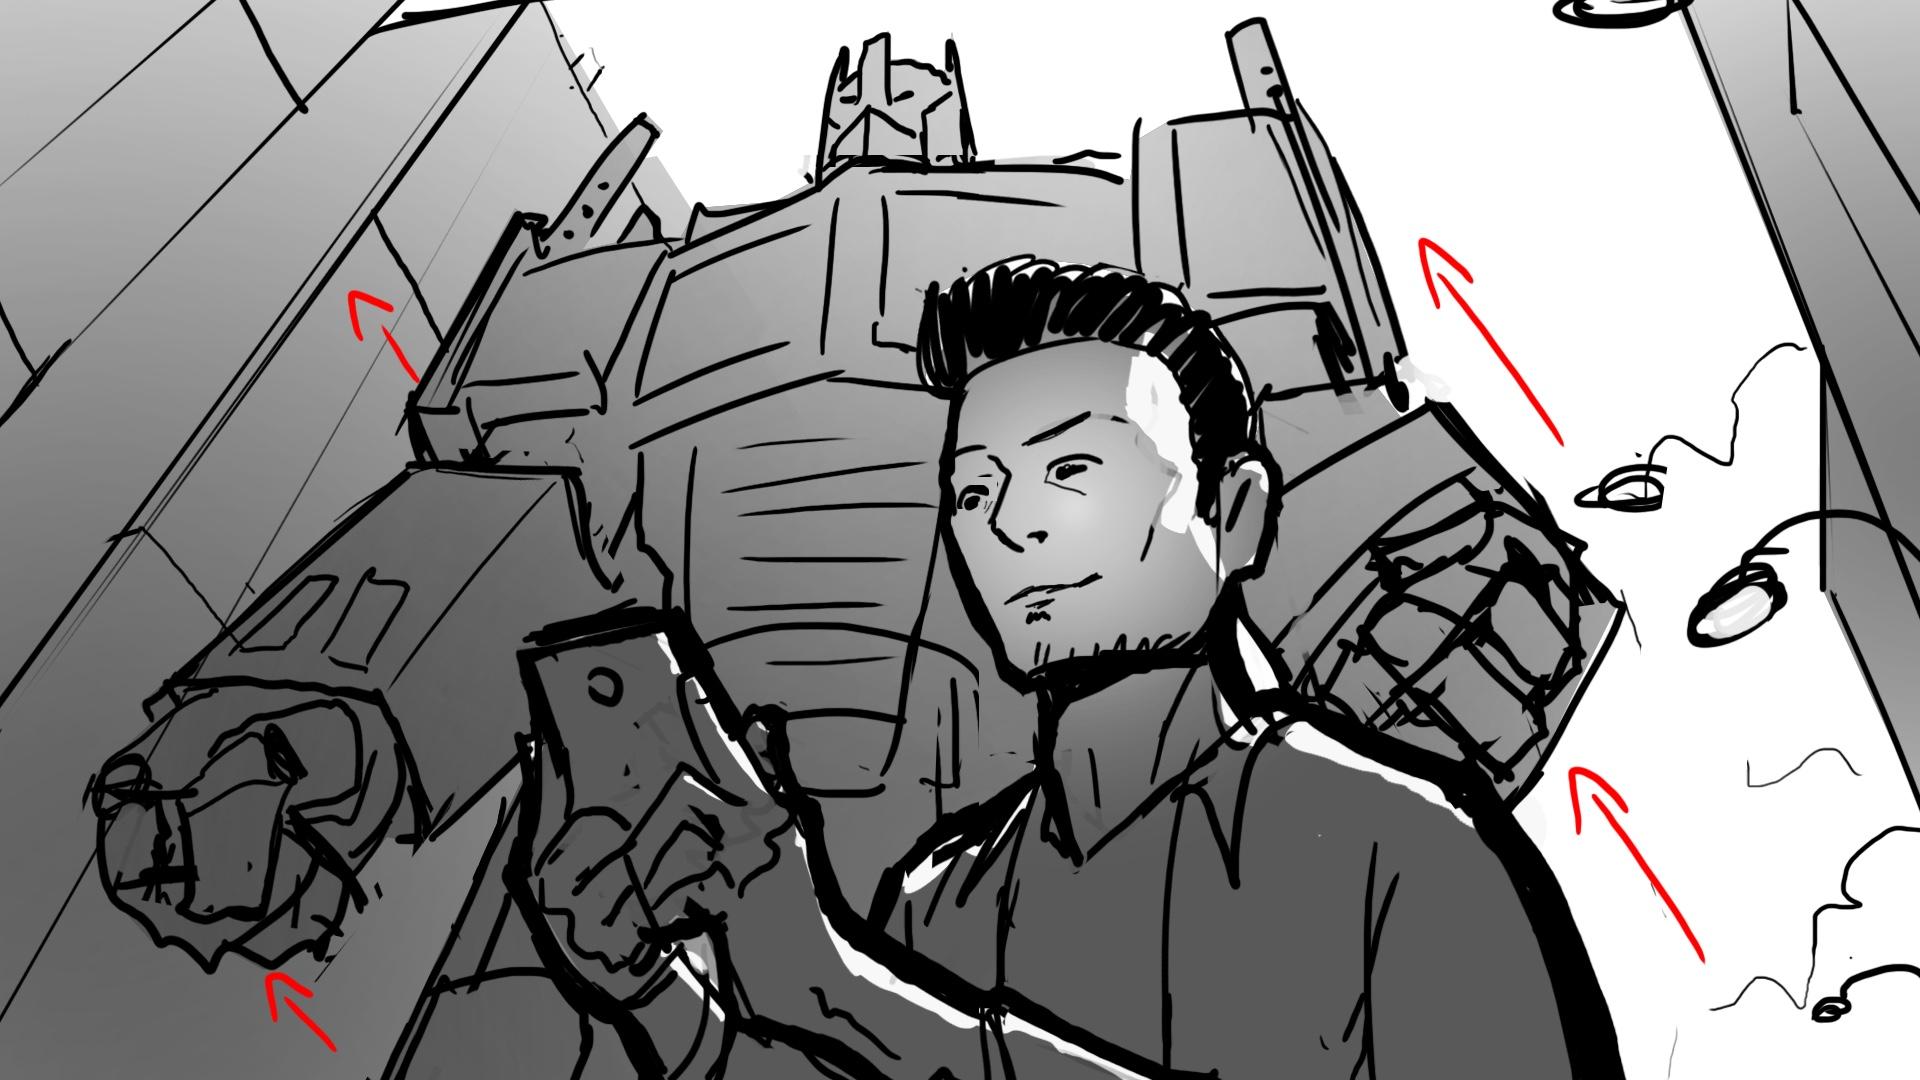 transformers_TVspot_storyboards_070b_v002.jpg